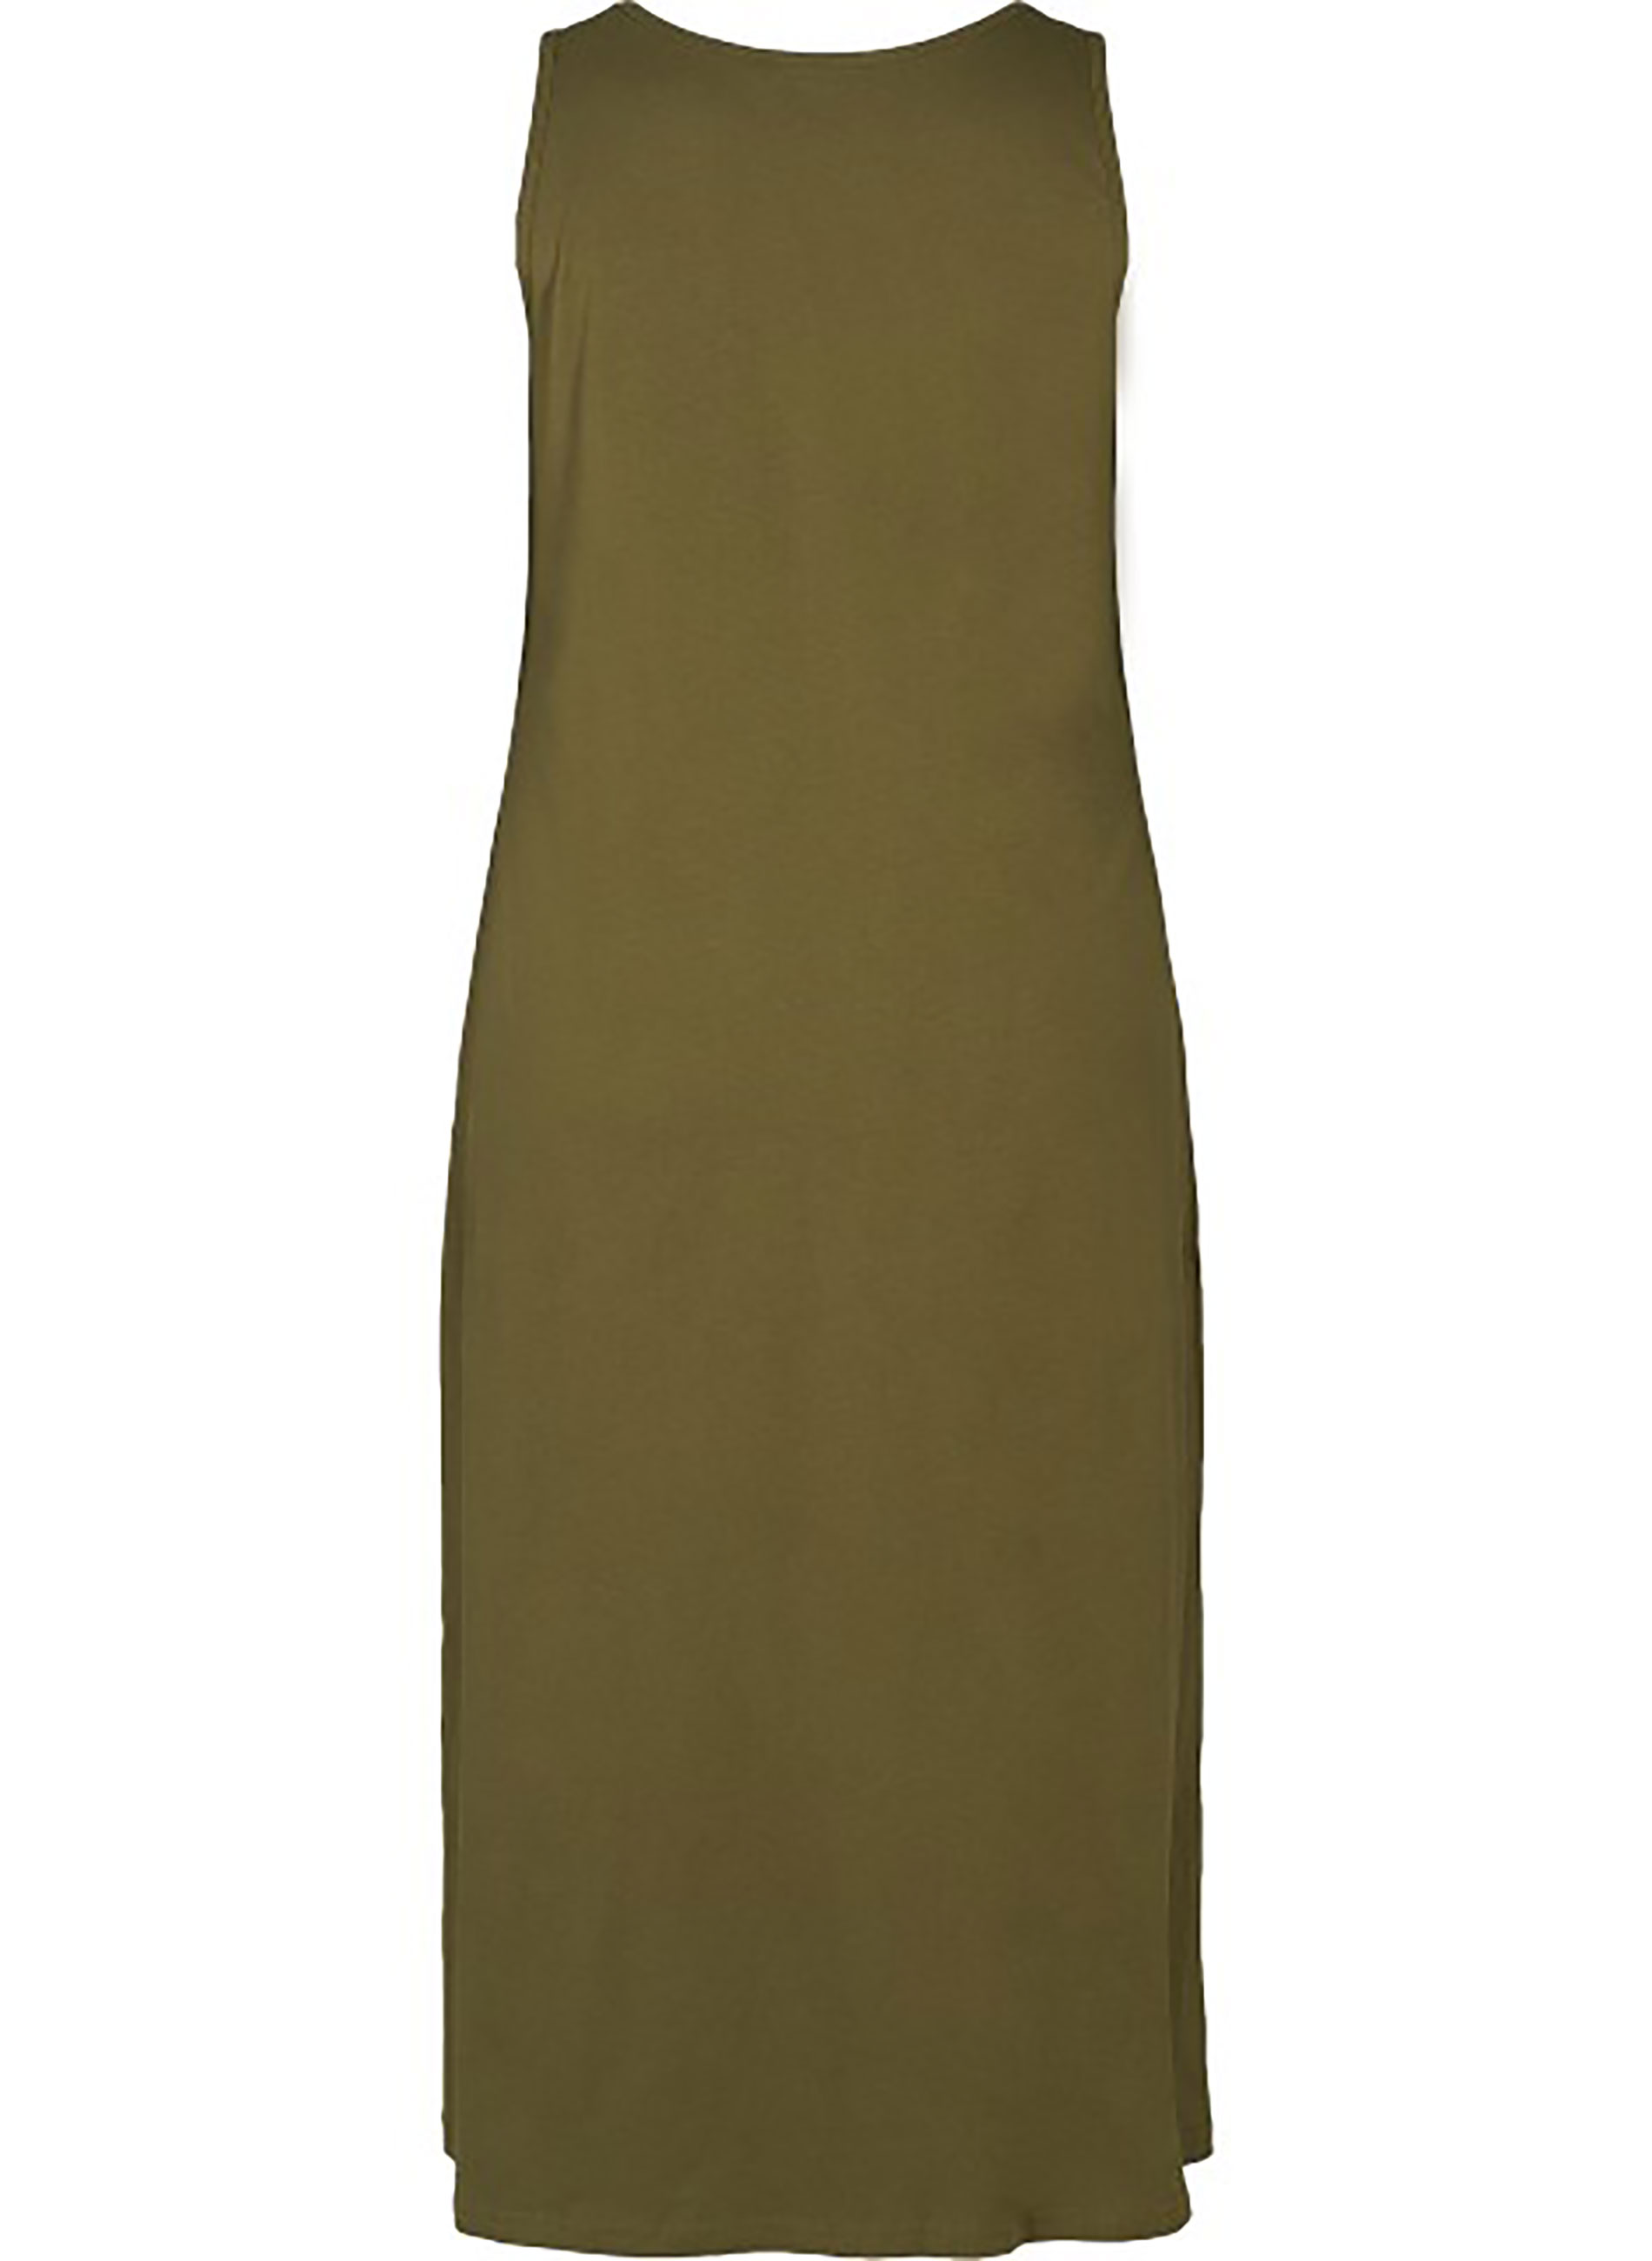 8660a080eaaa ΜΕΓΑΛΑ ΜΕΓΕΘΗ ΦΟΡΕΜΑΤΑ    Φόρεμα Μάξι Χακί Βαμβακερό - Μόδα σε ...